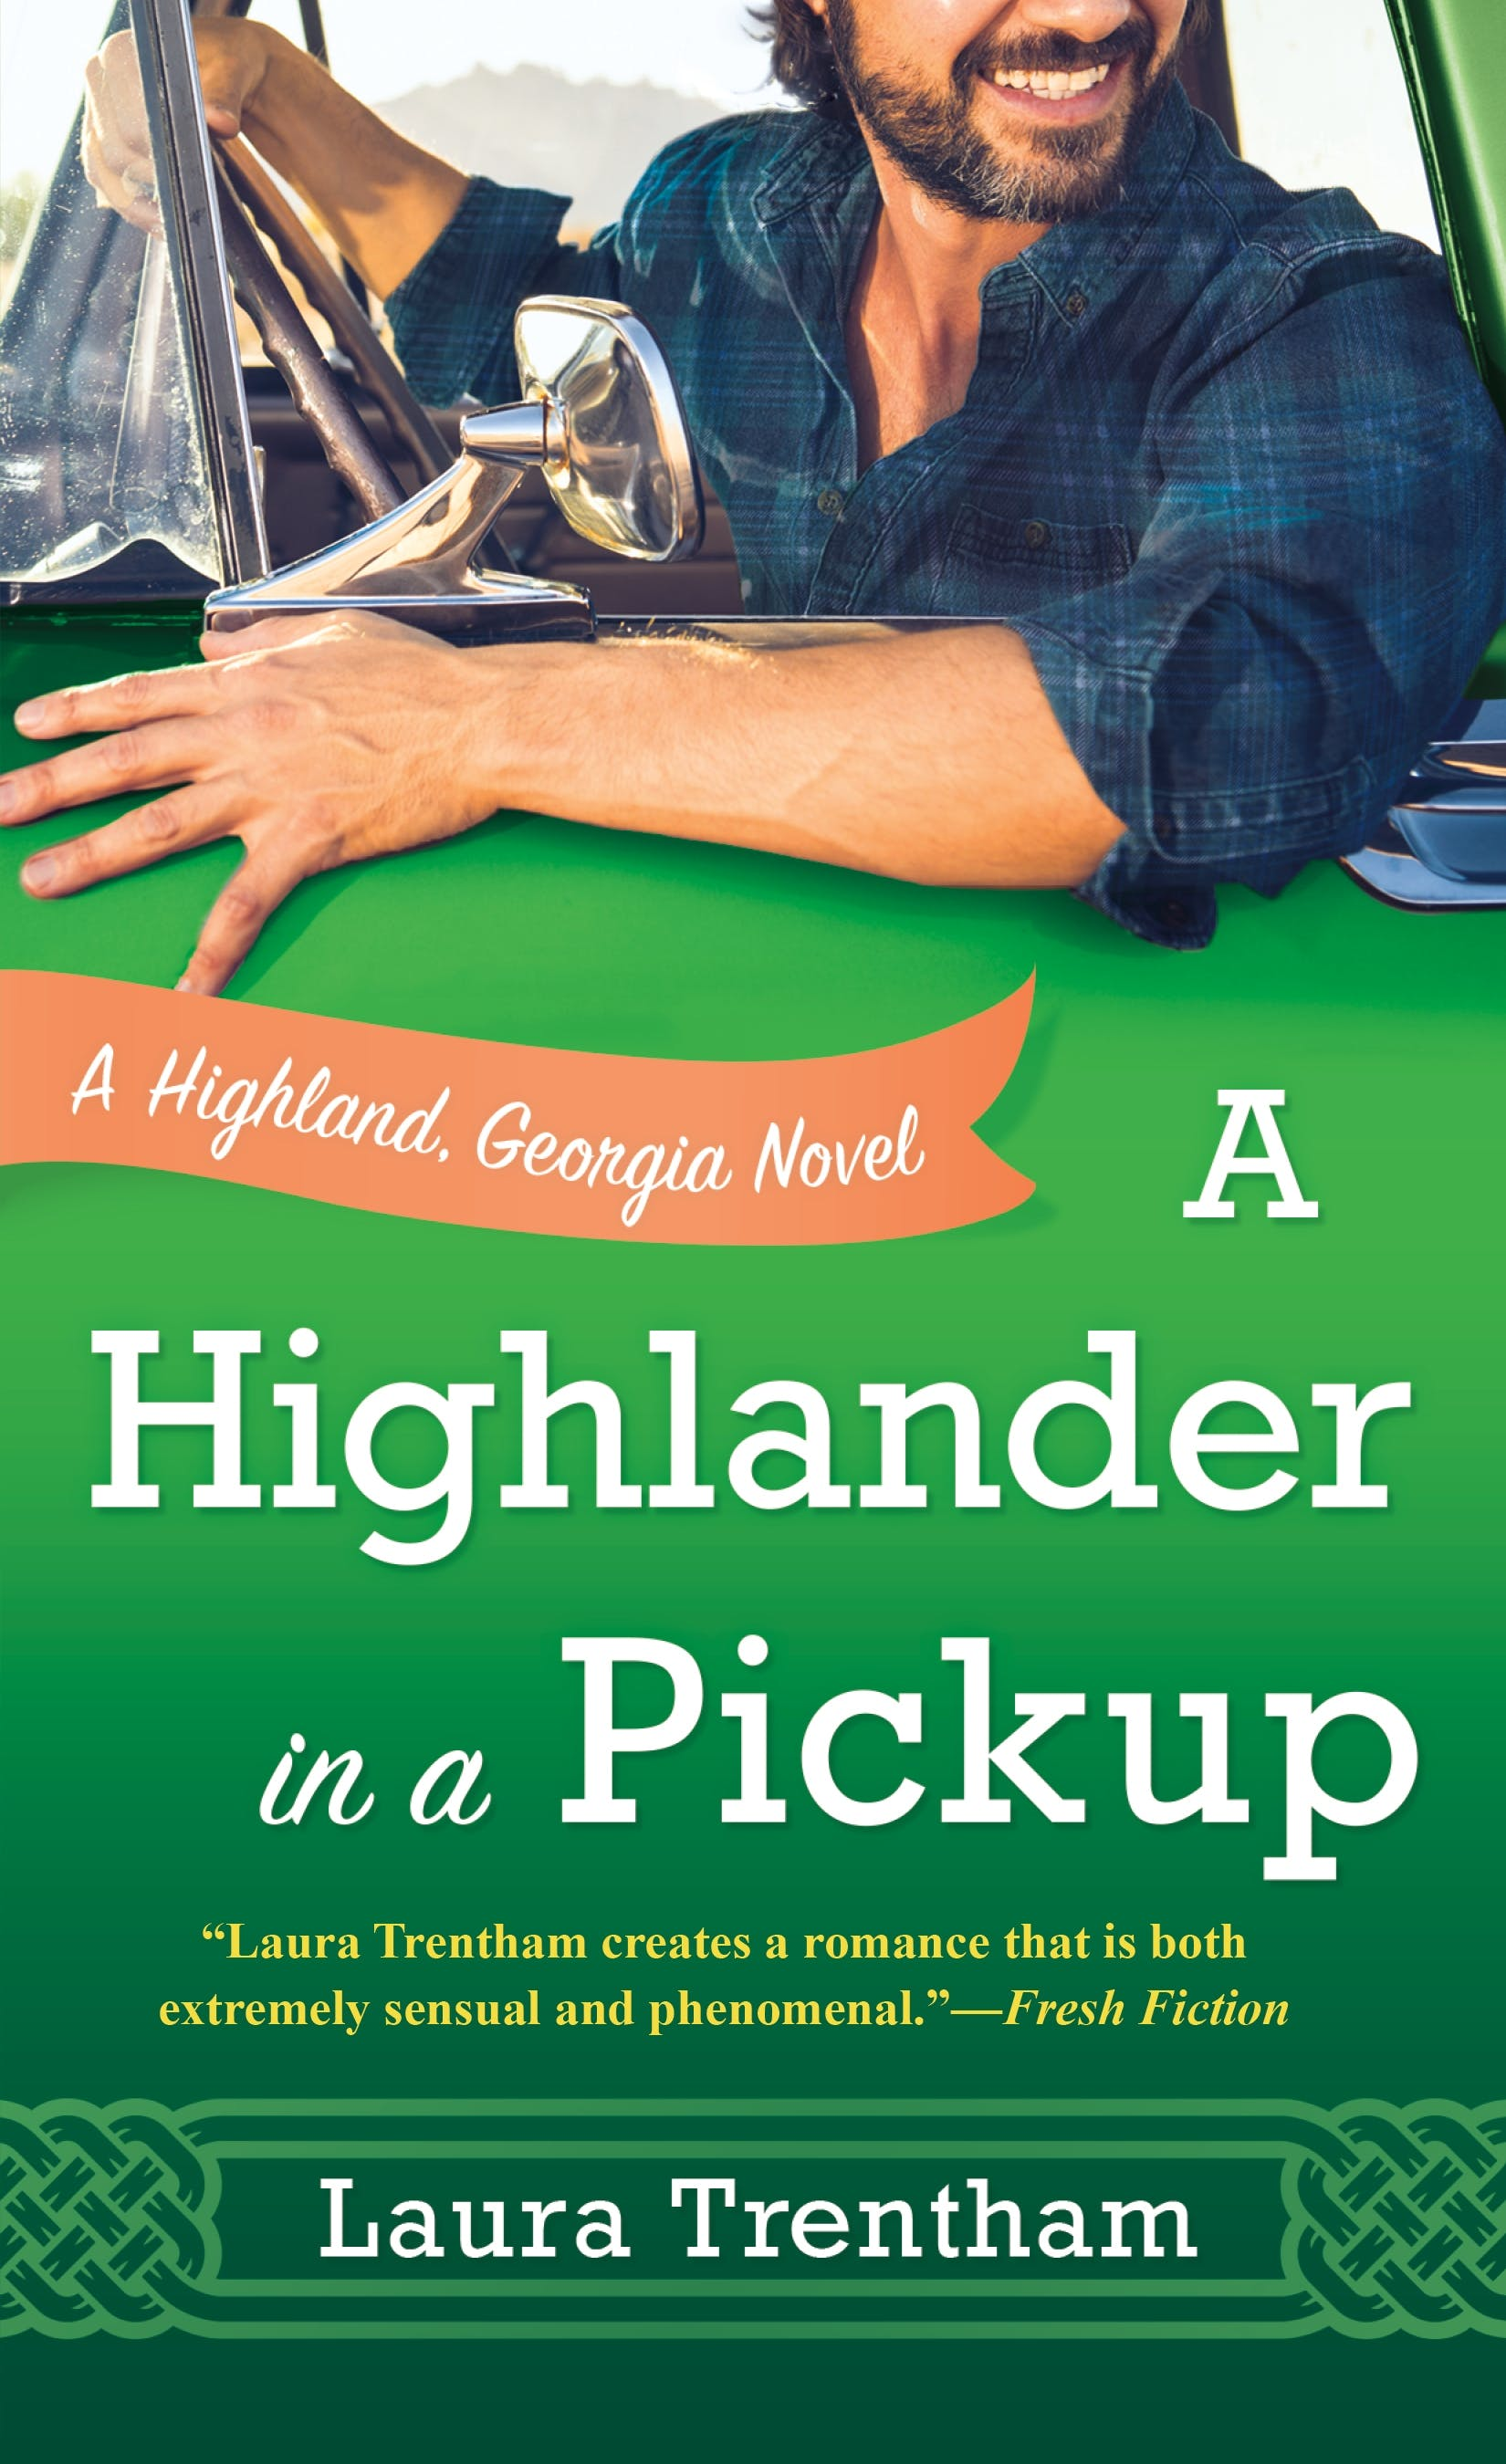 Image of A Highlander in a Pickup